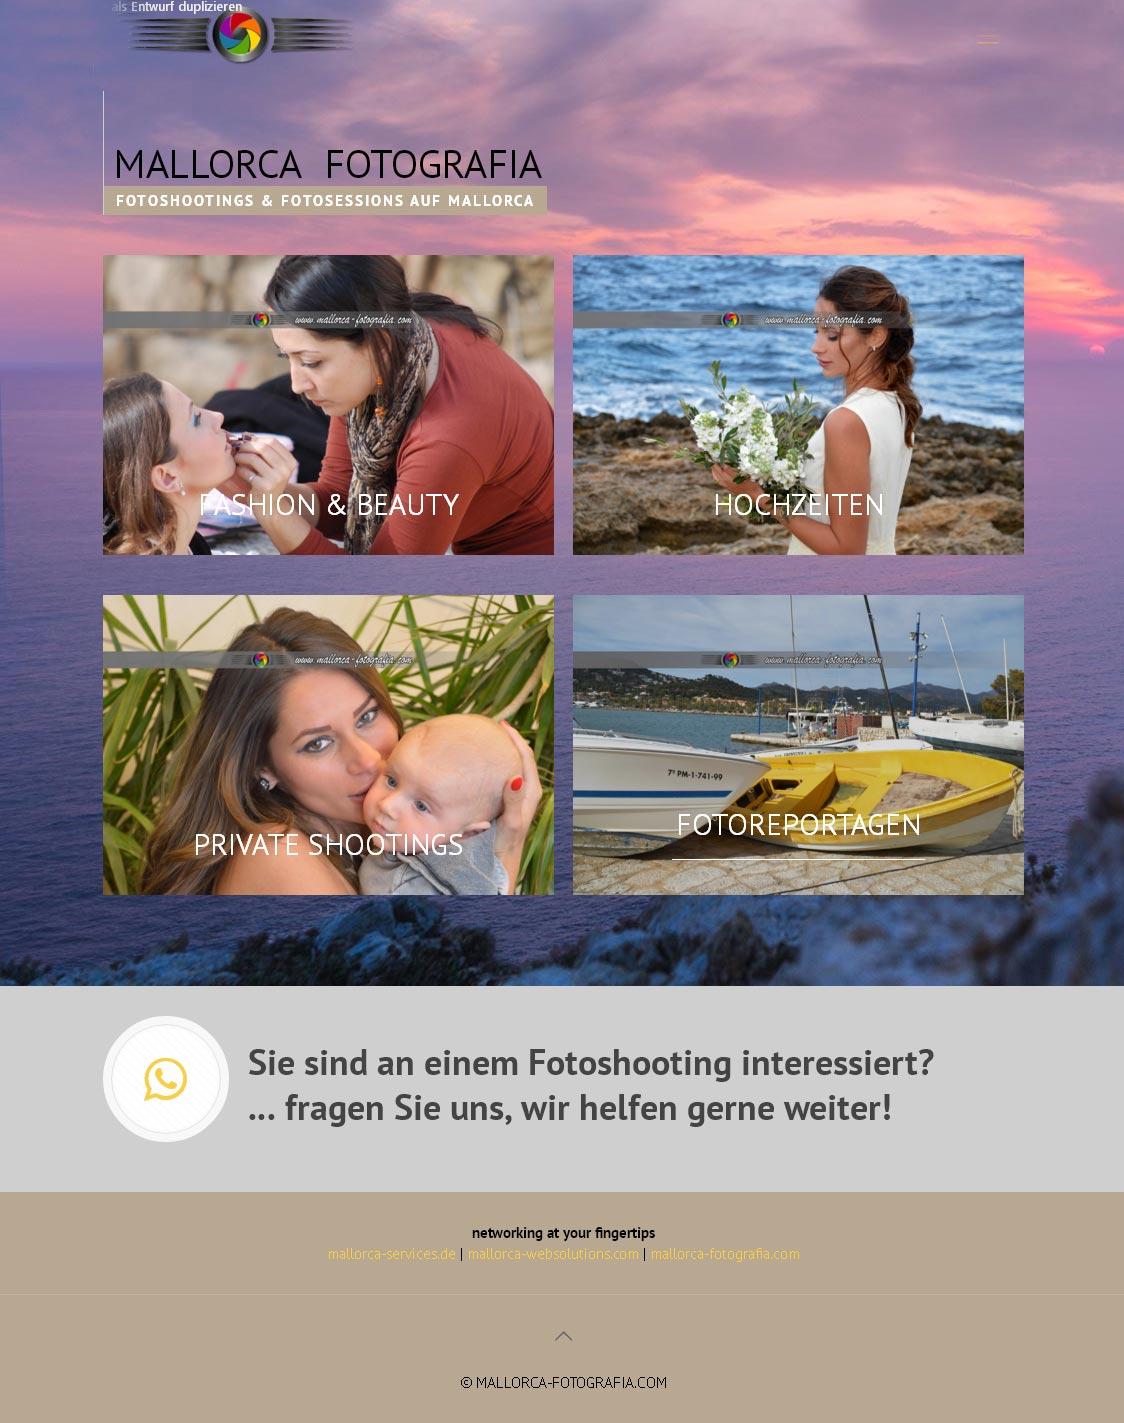 mallorca-fotografia.com<br /> Entwicklung der CI, Grafik & Layout für Online<br />www.mallorca-fotografia.com